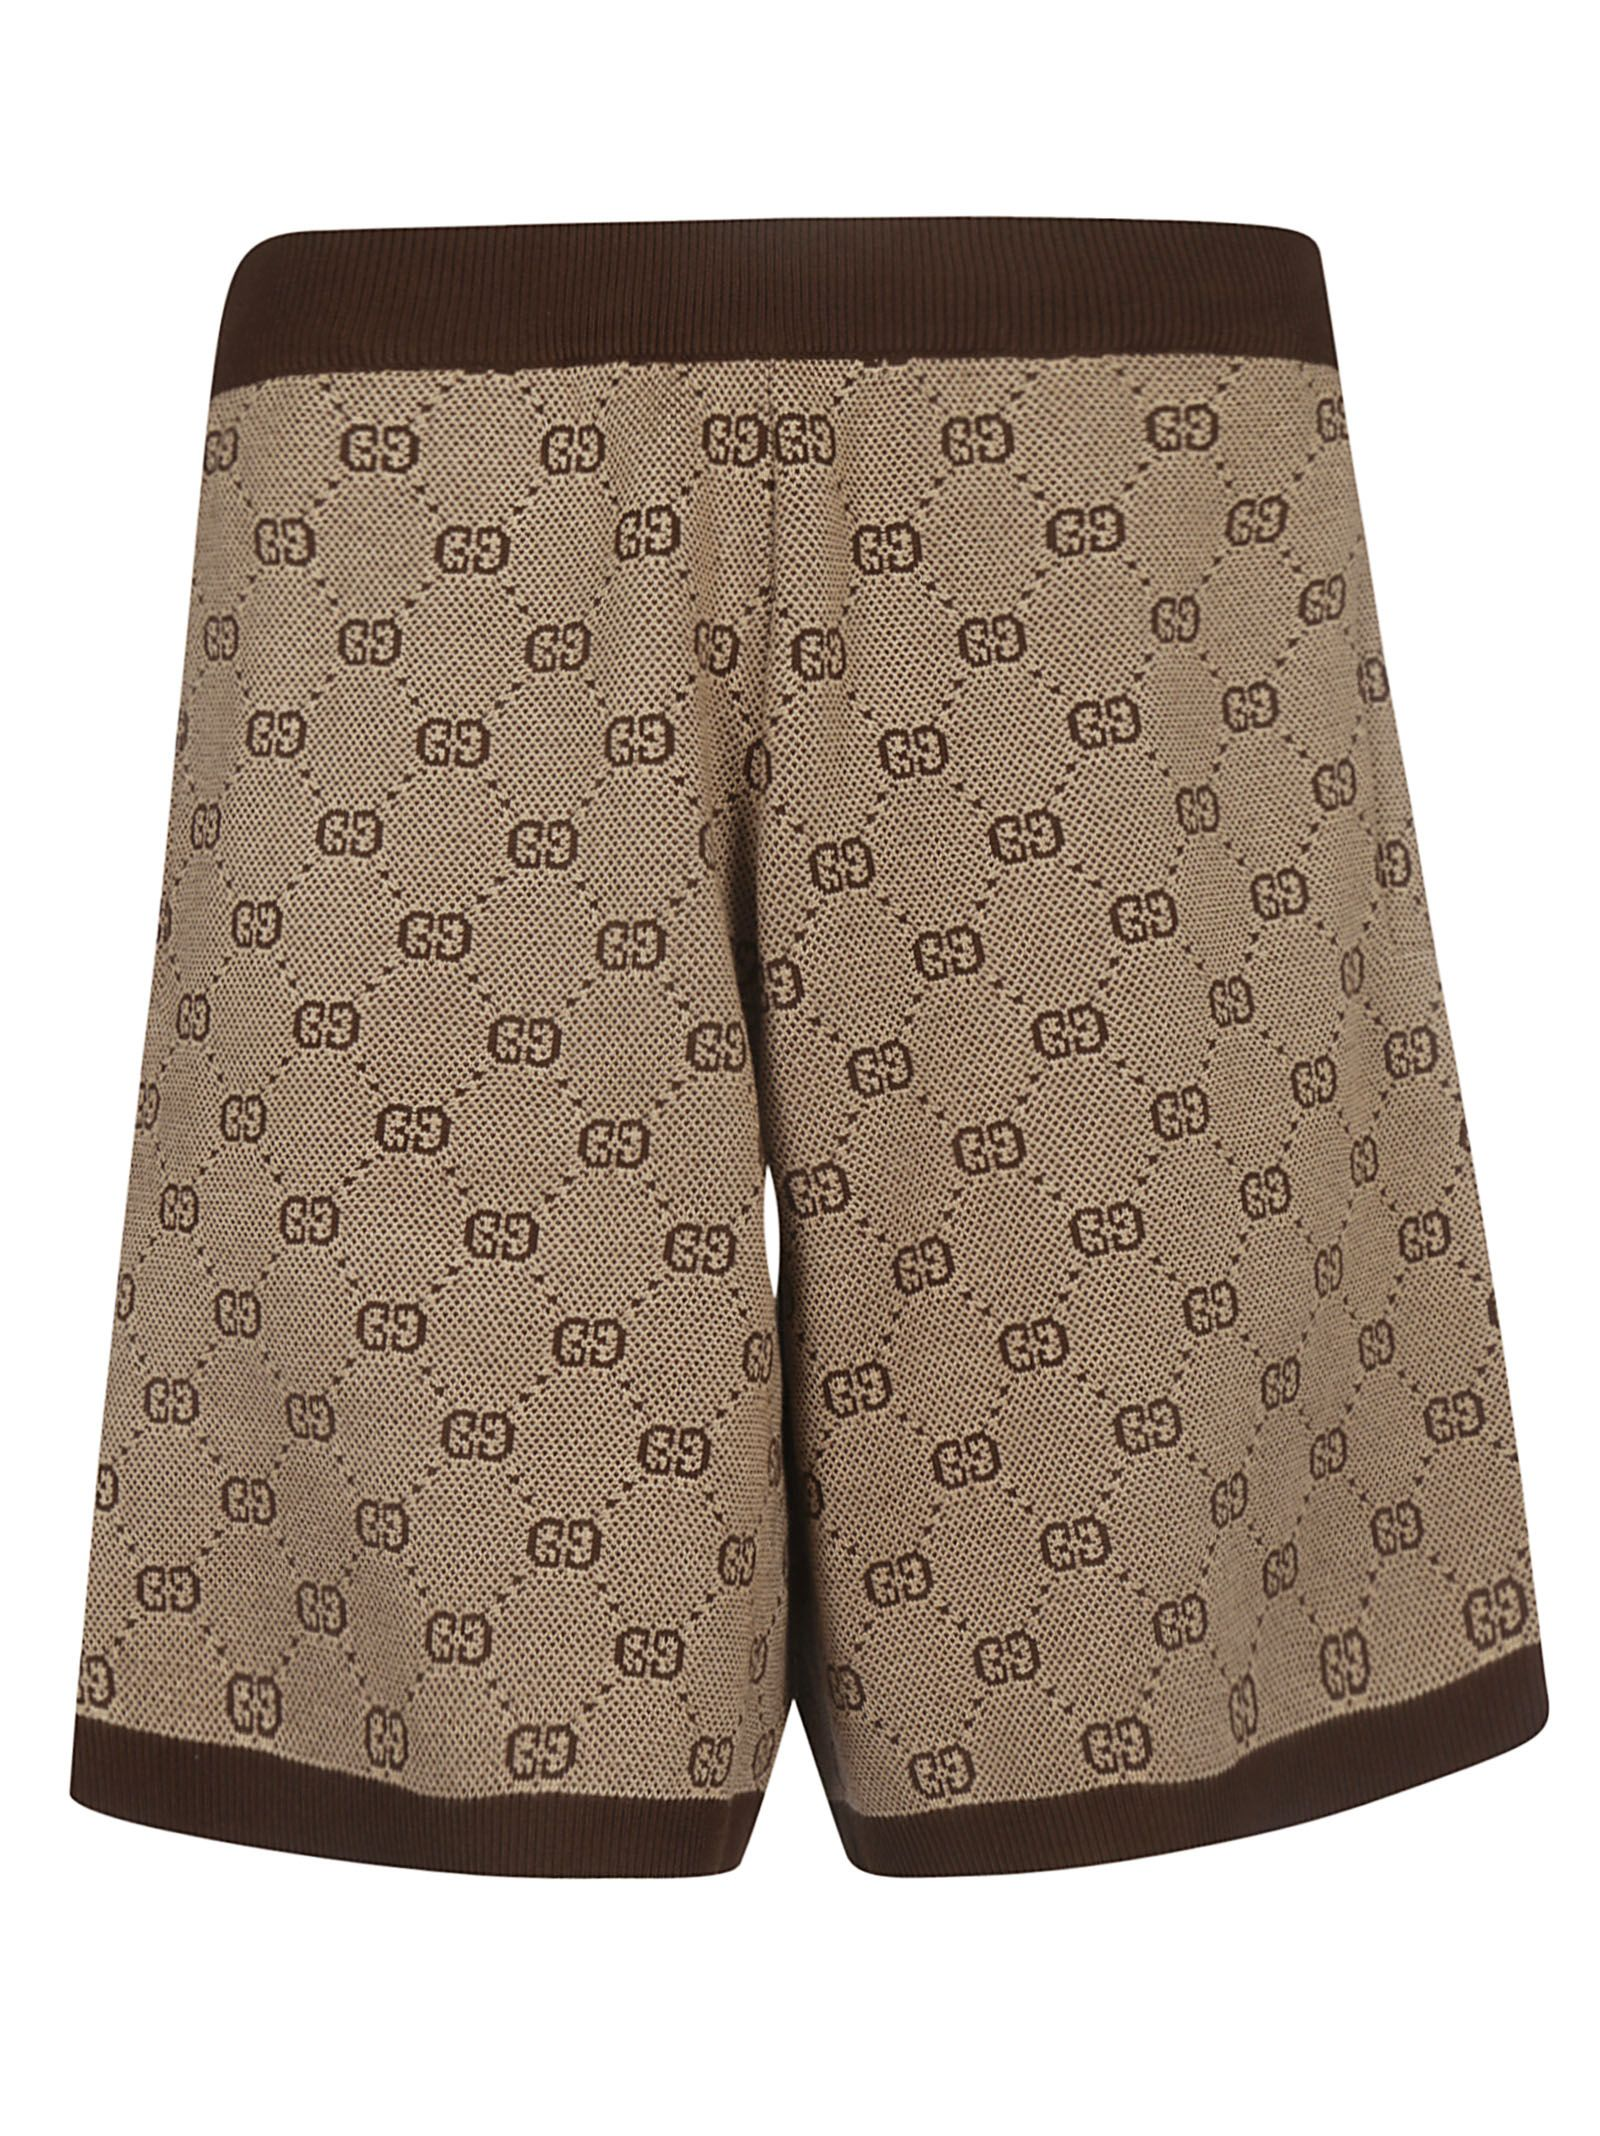 9309311d782 Gucci Gucci Gg Jacquard Knit Shorts - Camel multicolor - 10920776 ...